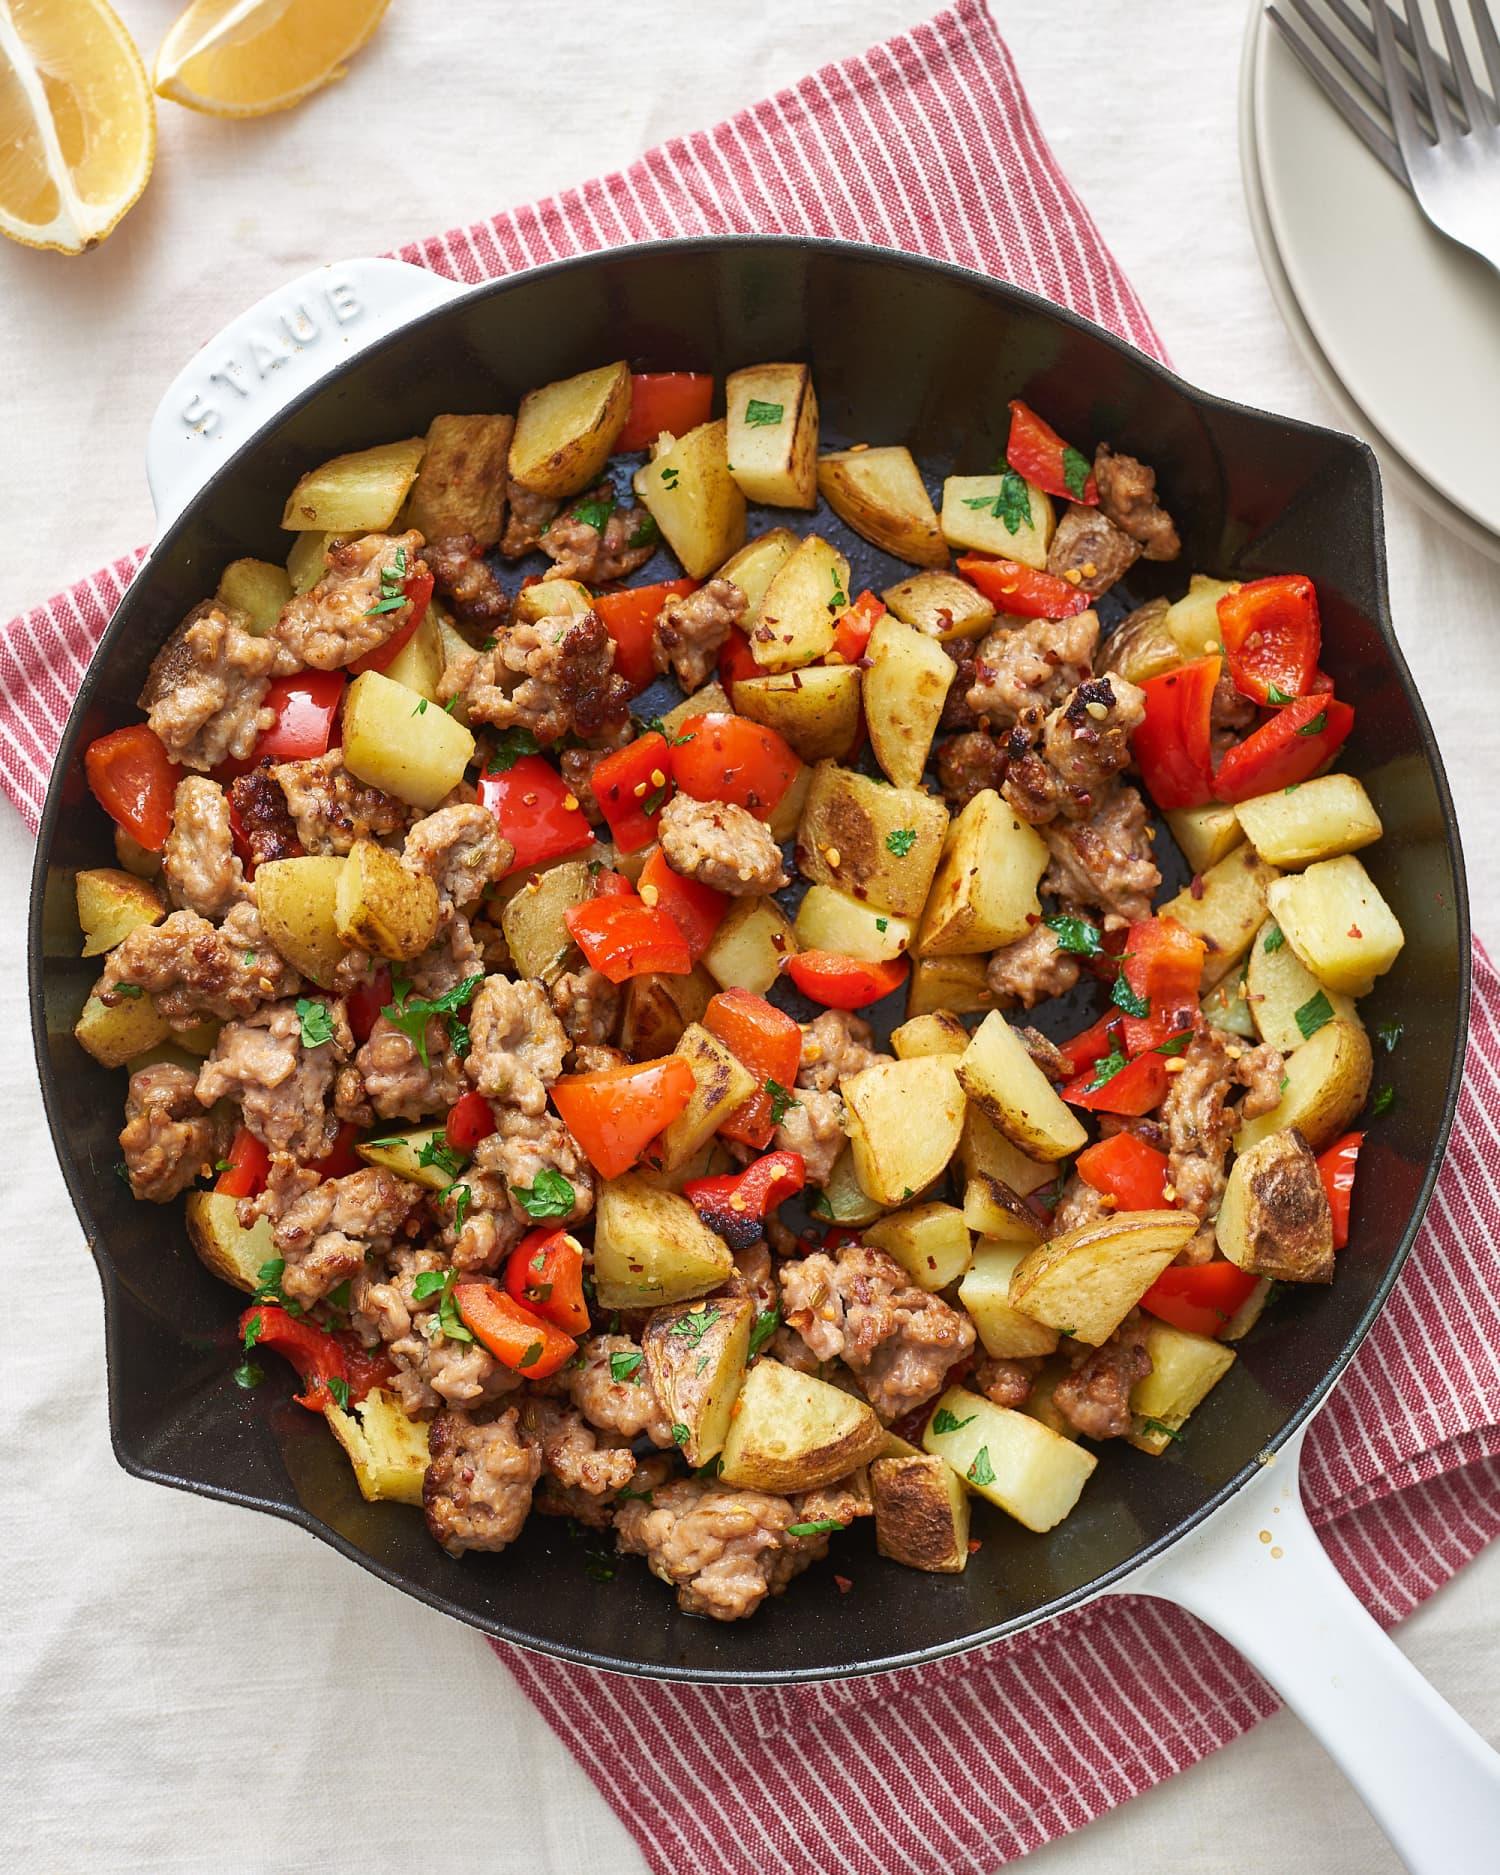 14 Breakfast Potato Recipes to Start Your Morning Right